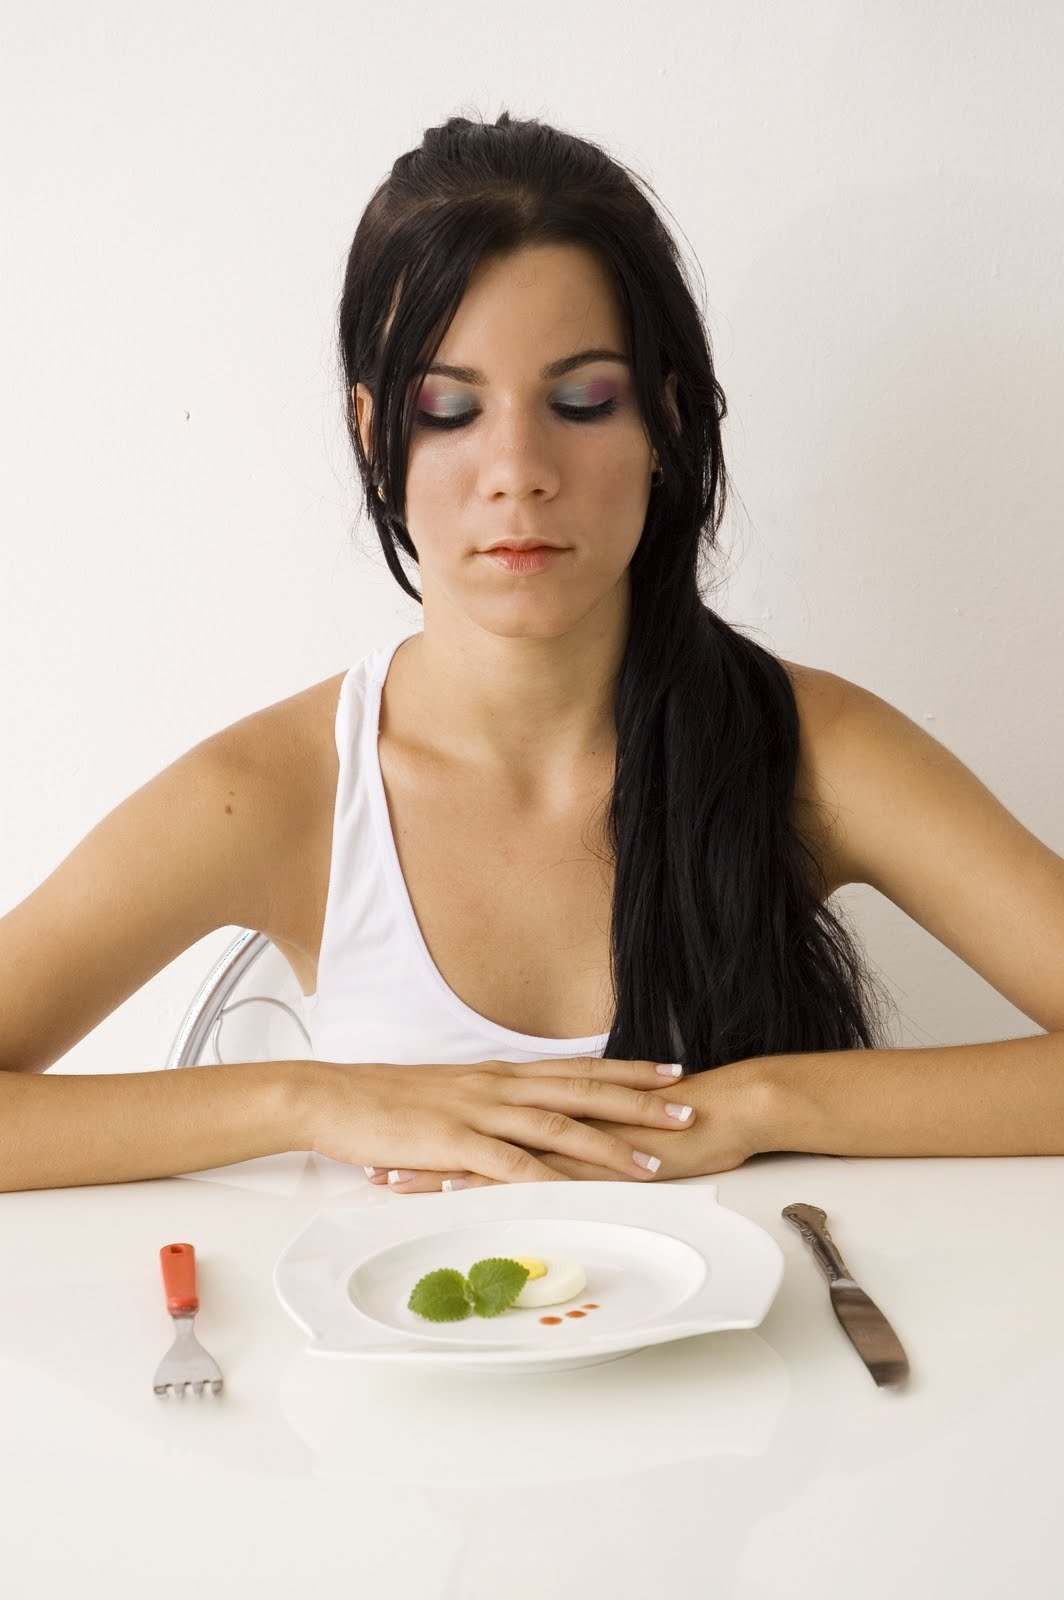 Eating Disorder Group February